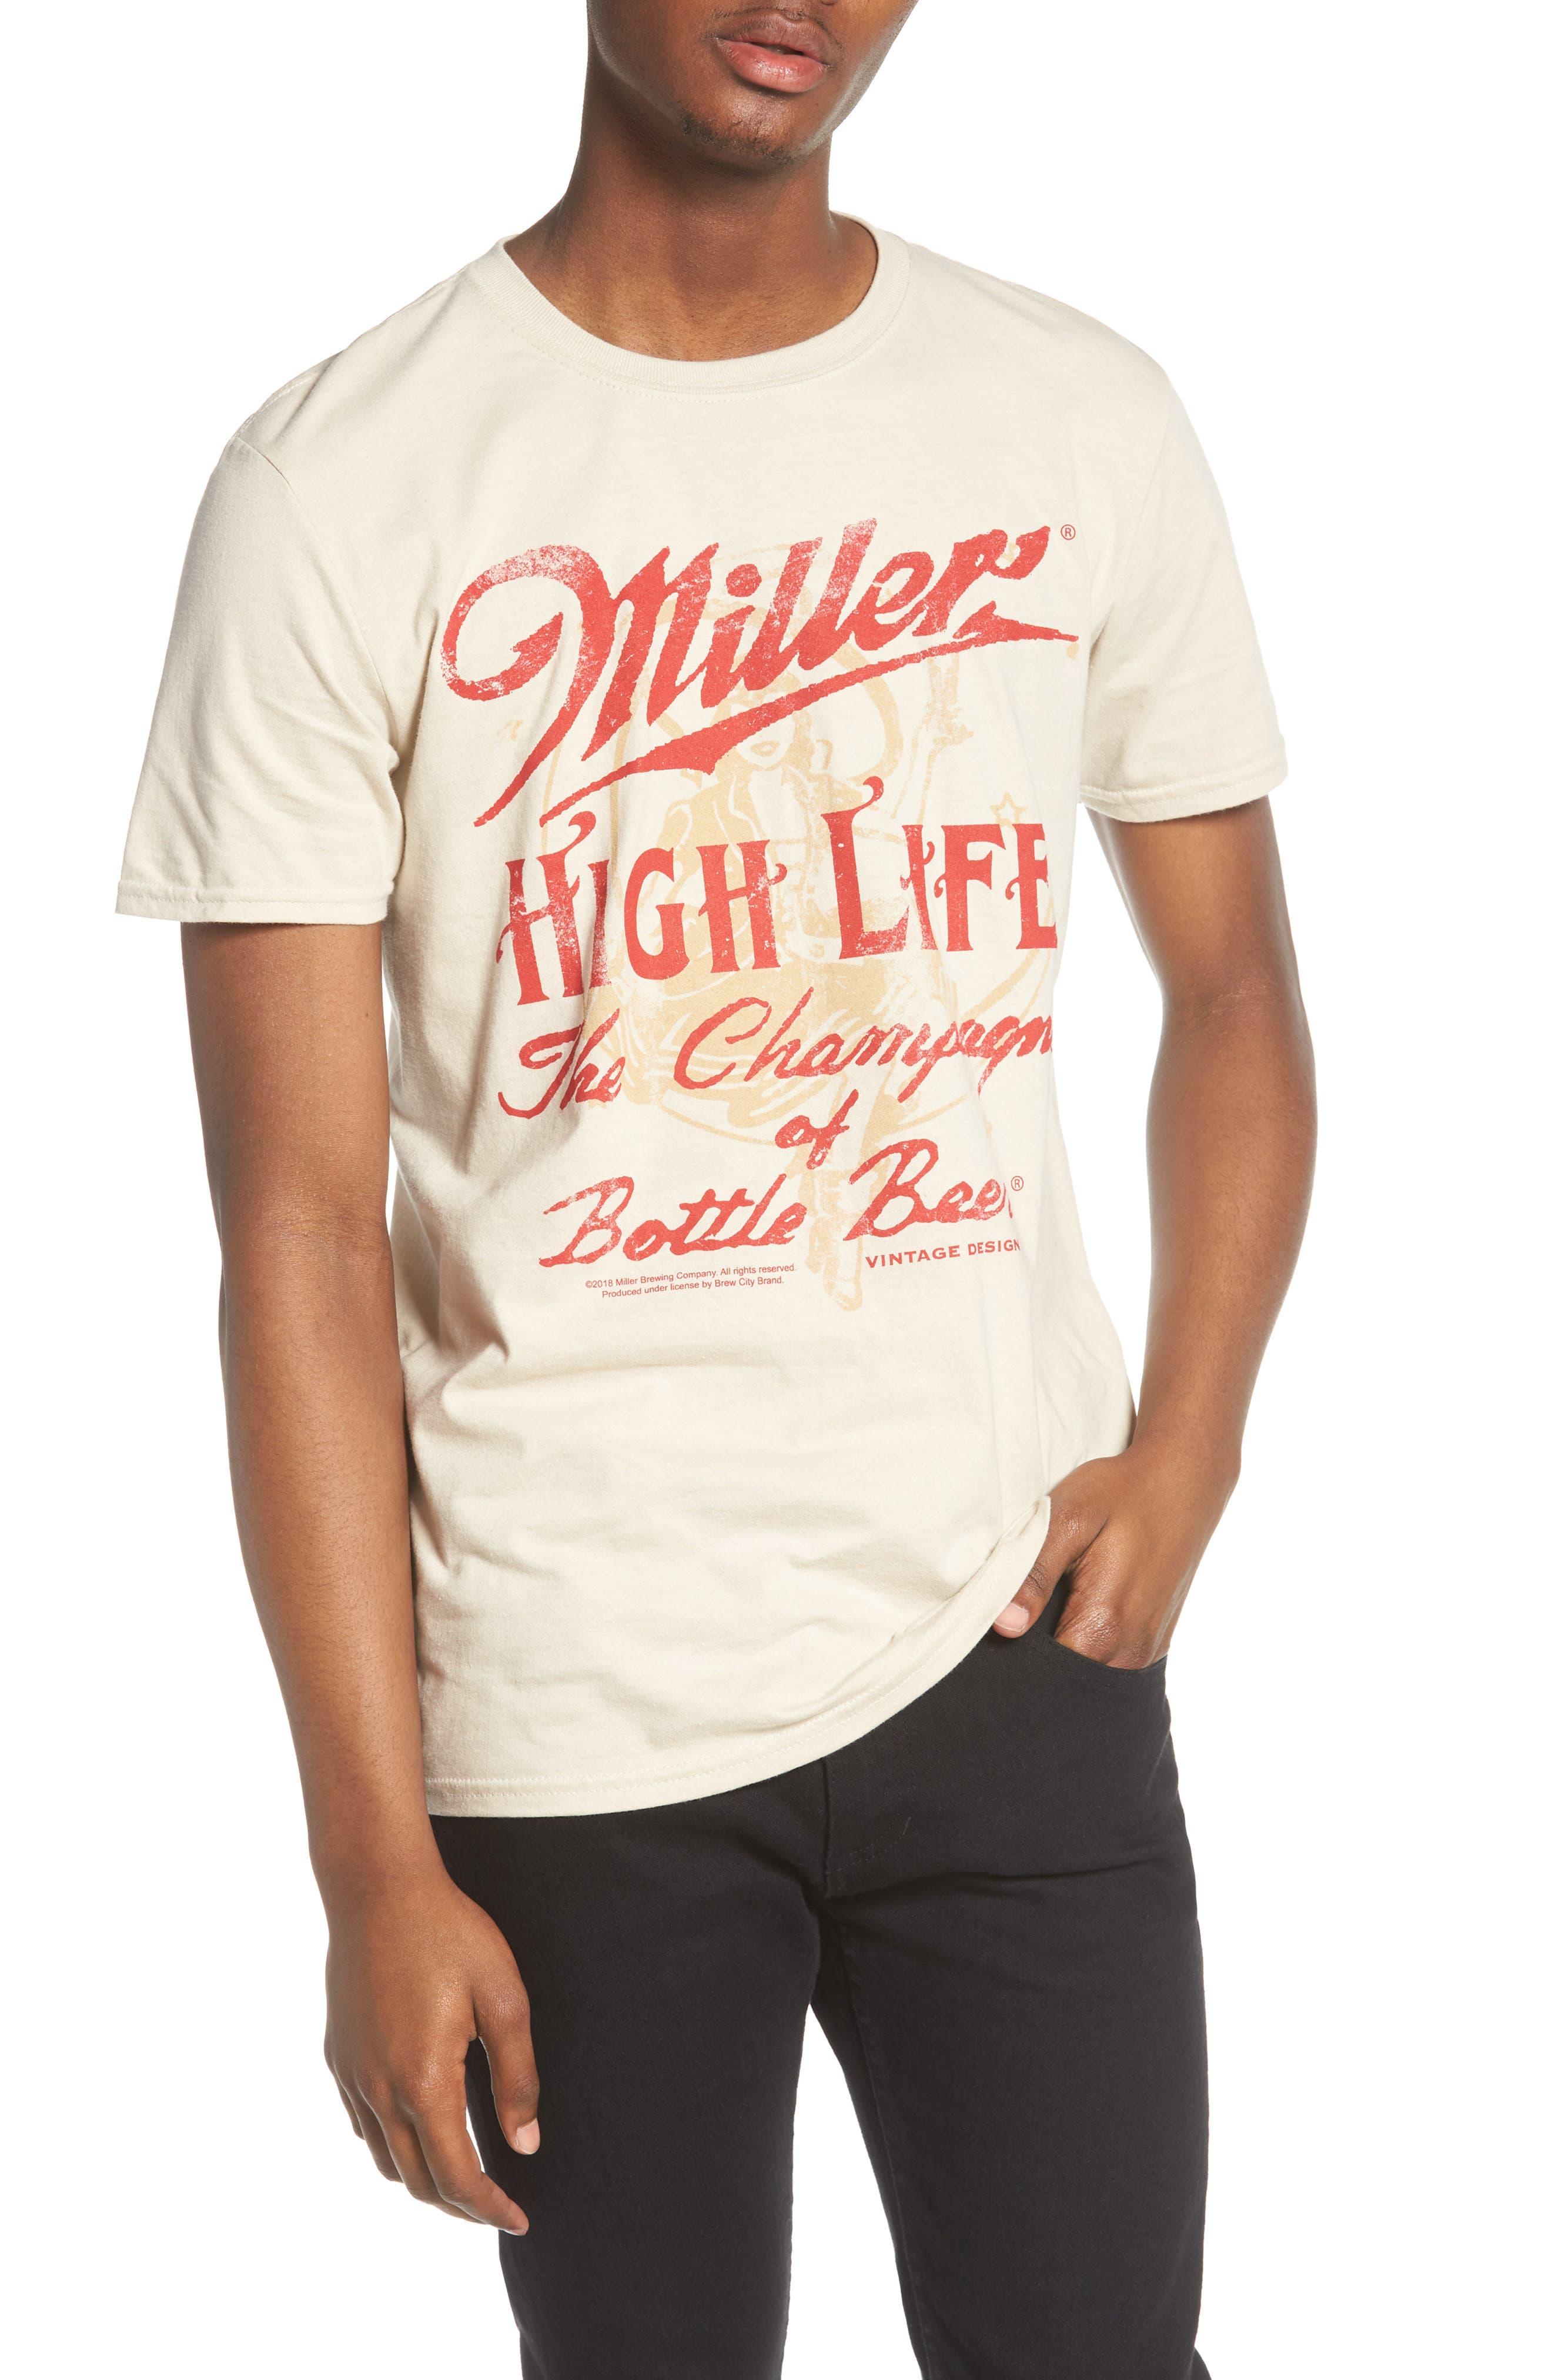 Outlet Visit The Rail Miller High Life T-Shirt Cheap Brand New Unisex 0LtYZ